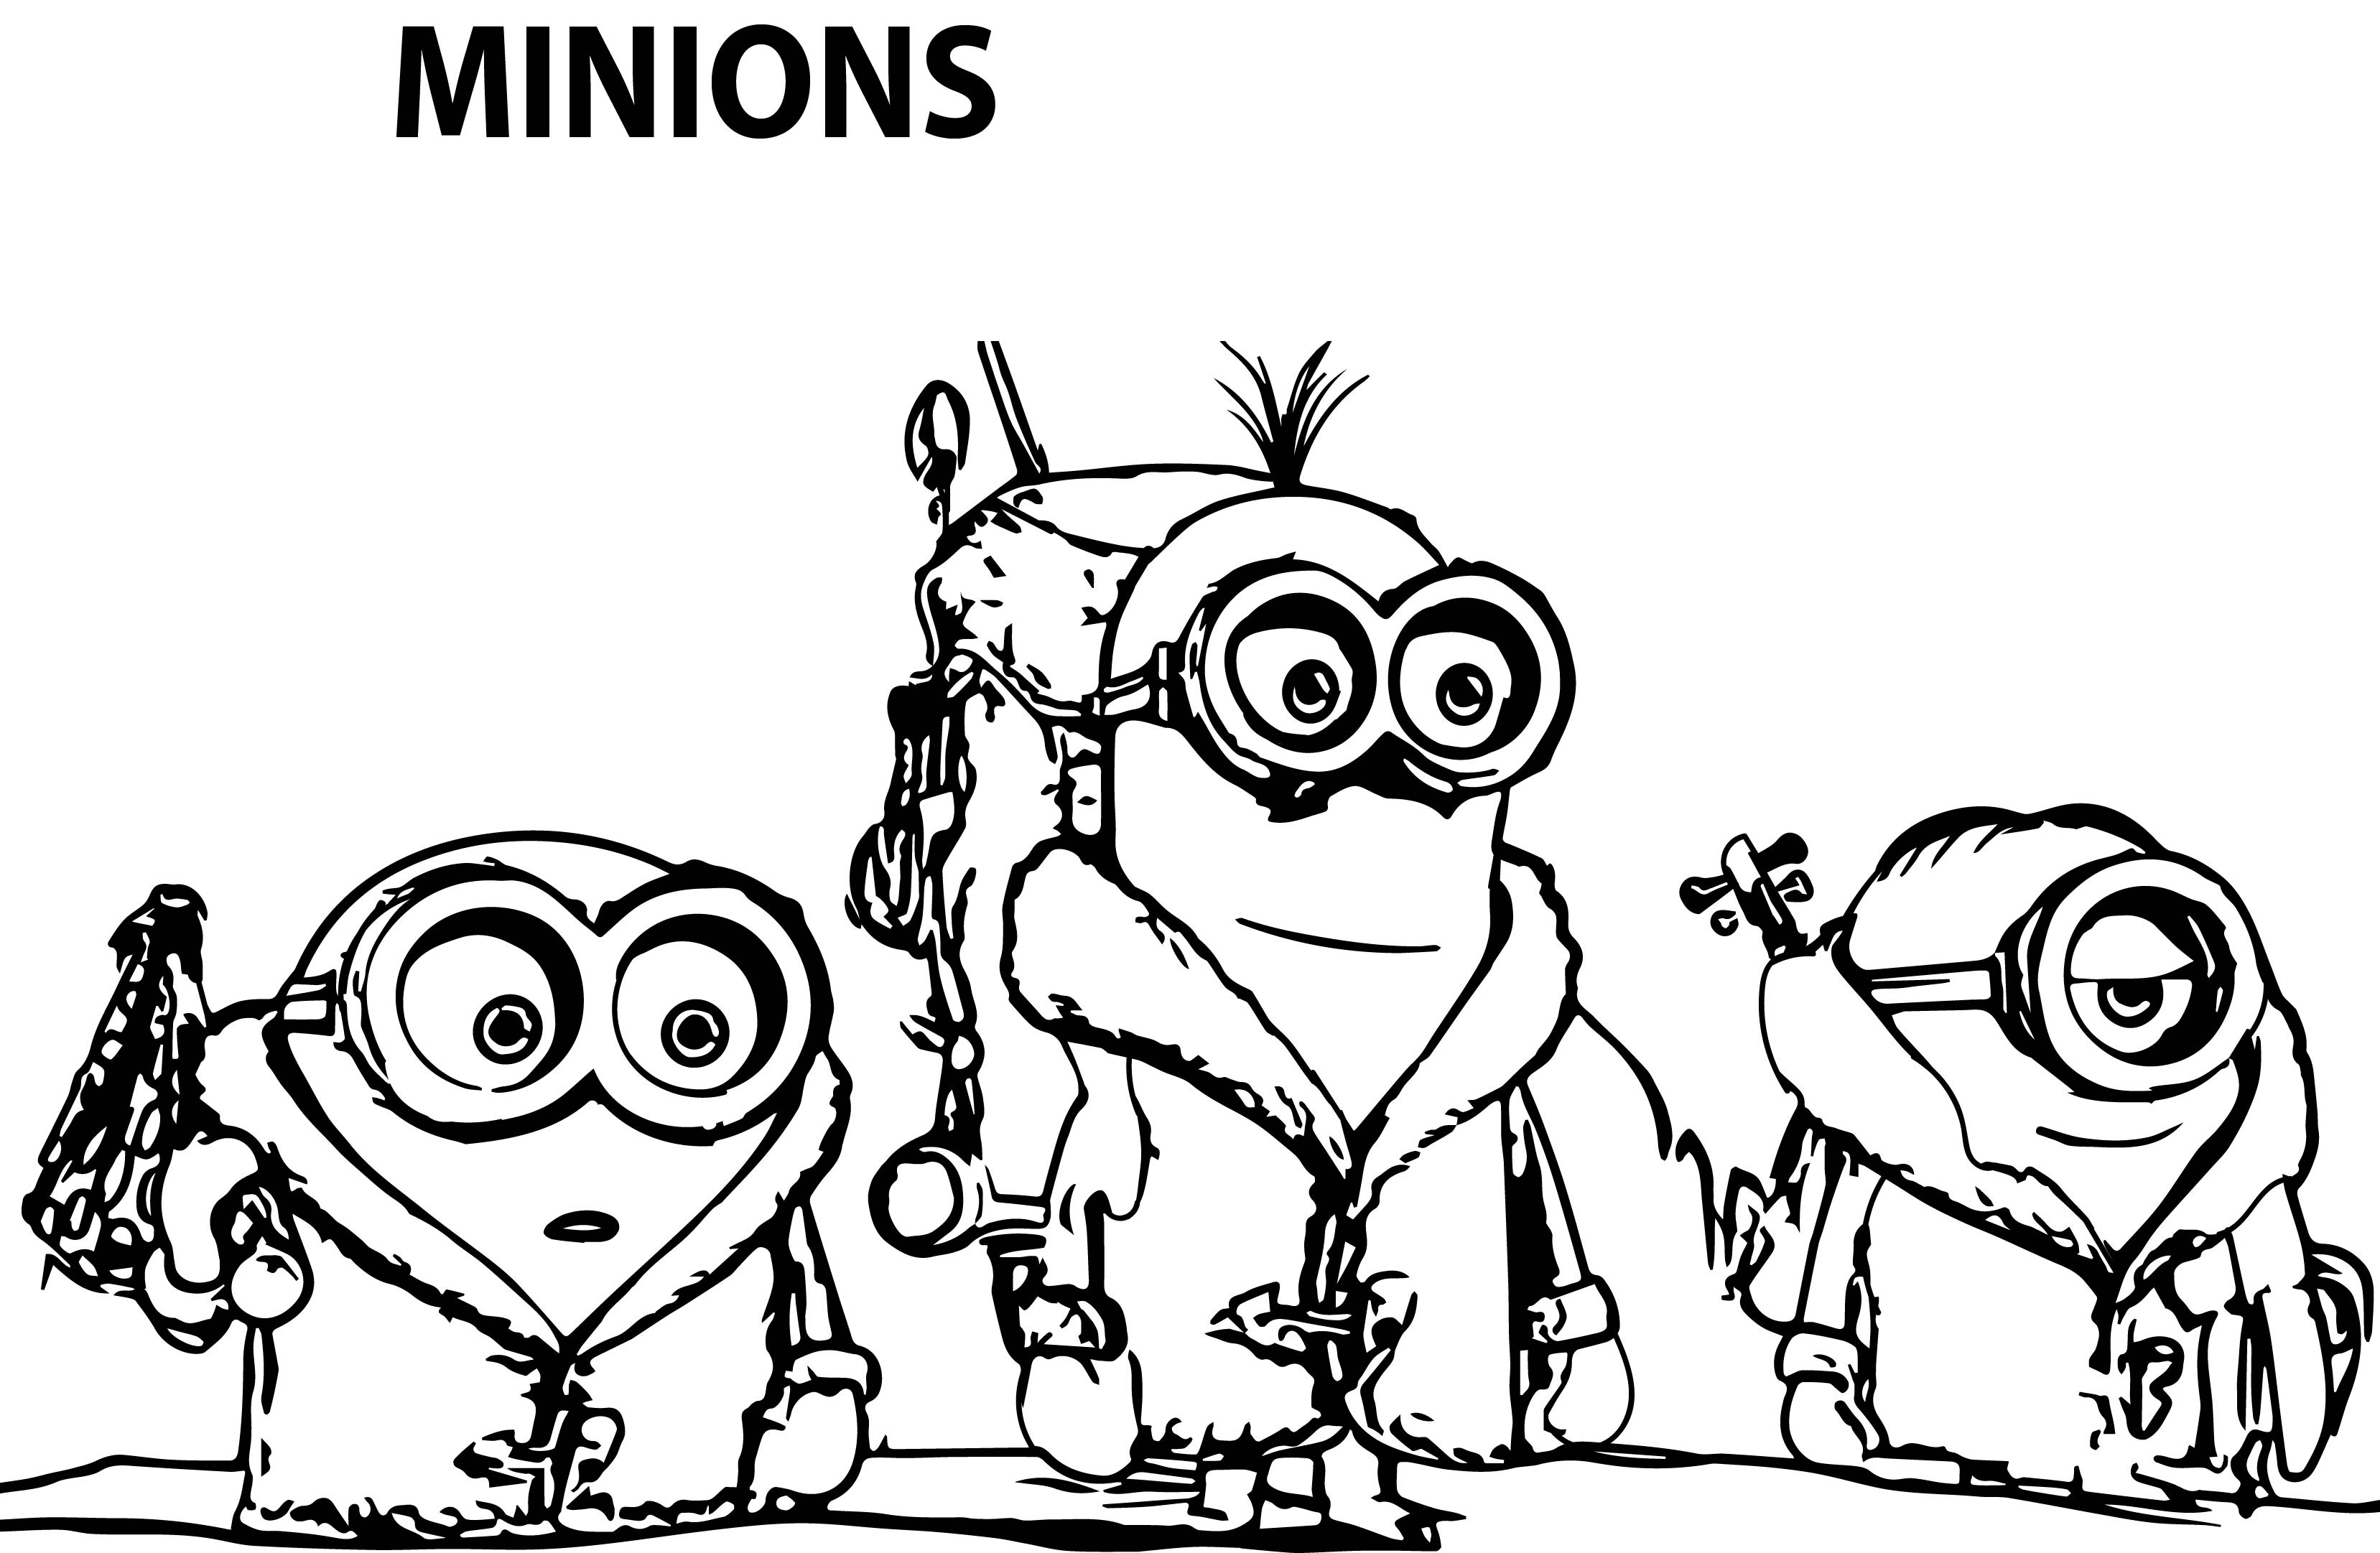 100 Dibujos De Minions Para Colorear Oh Kids Page 4